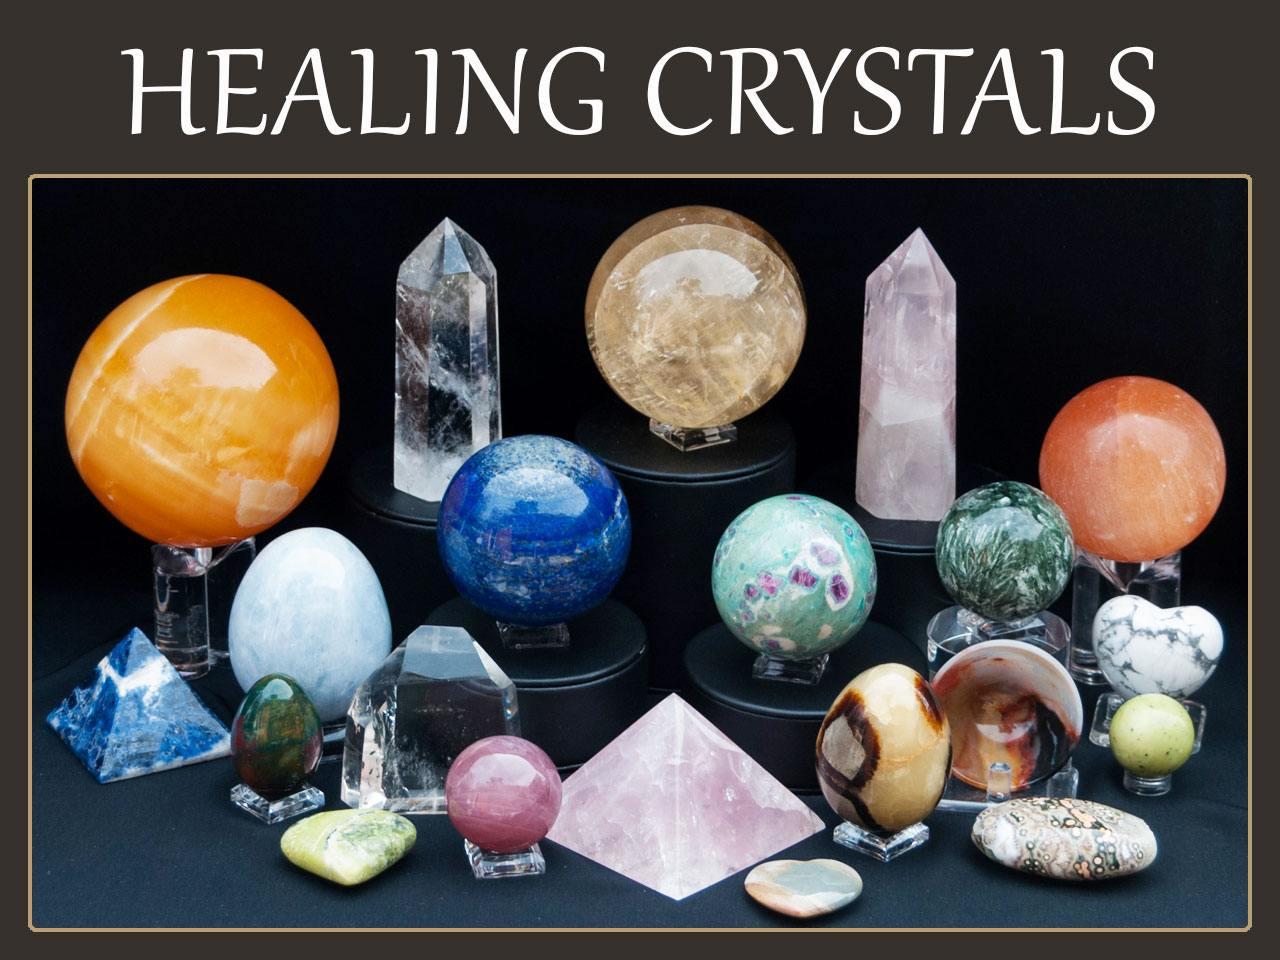 Healing Crystals, Spirit Animal Figurines | New Age